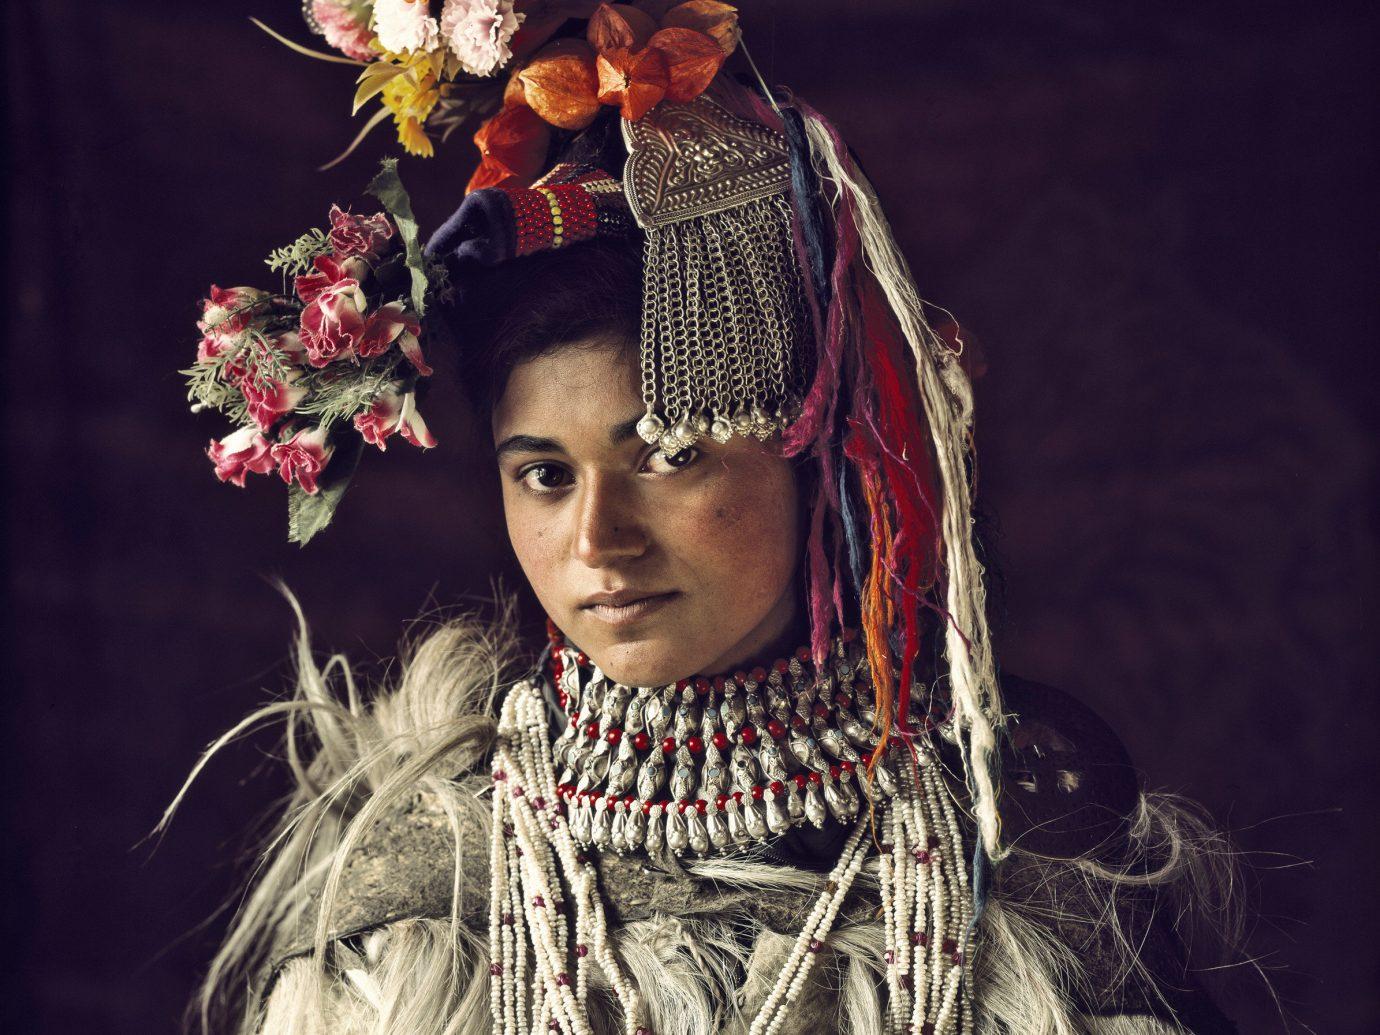 Arts + Culture clothing woman dancer flower